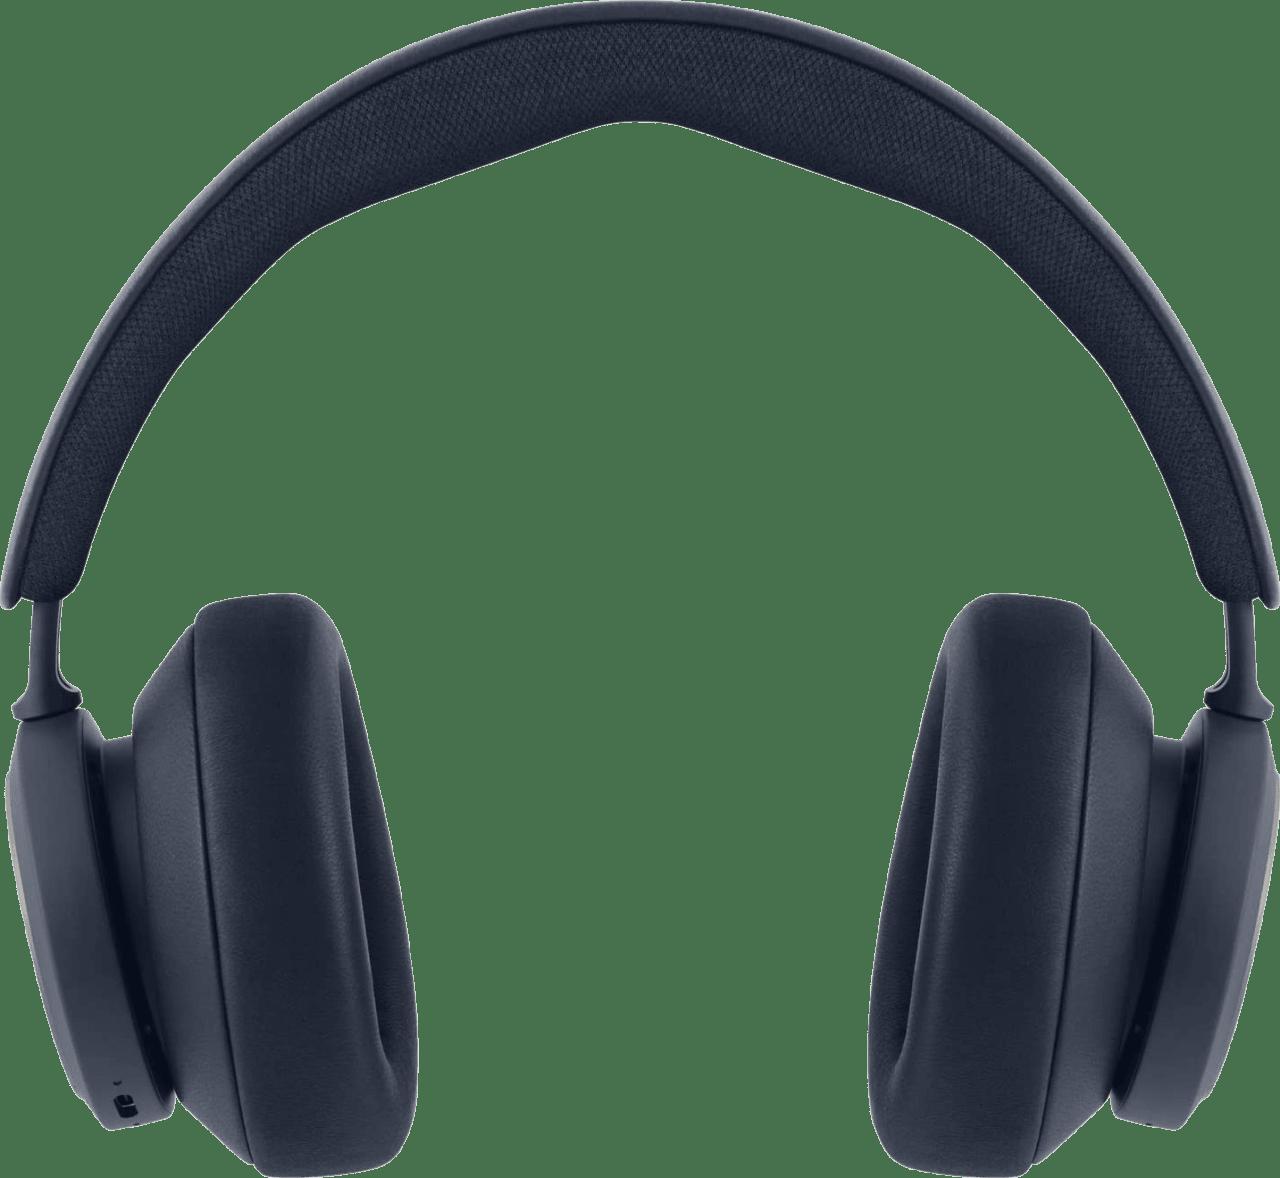 Navy Bang & Olufsen Beoplay Portal Over-ear Gaming Headphones.2